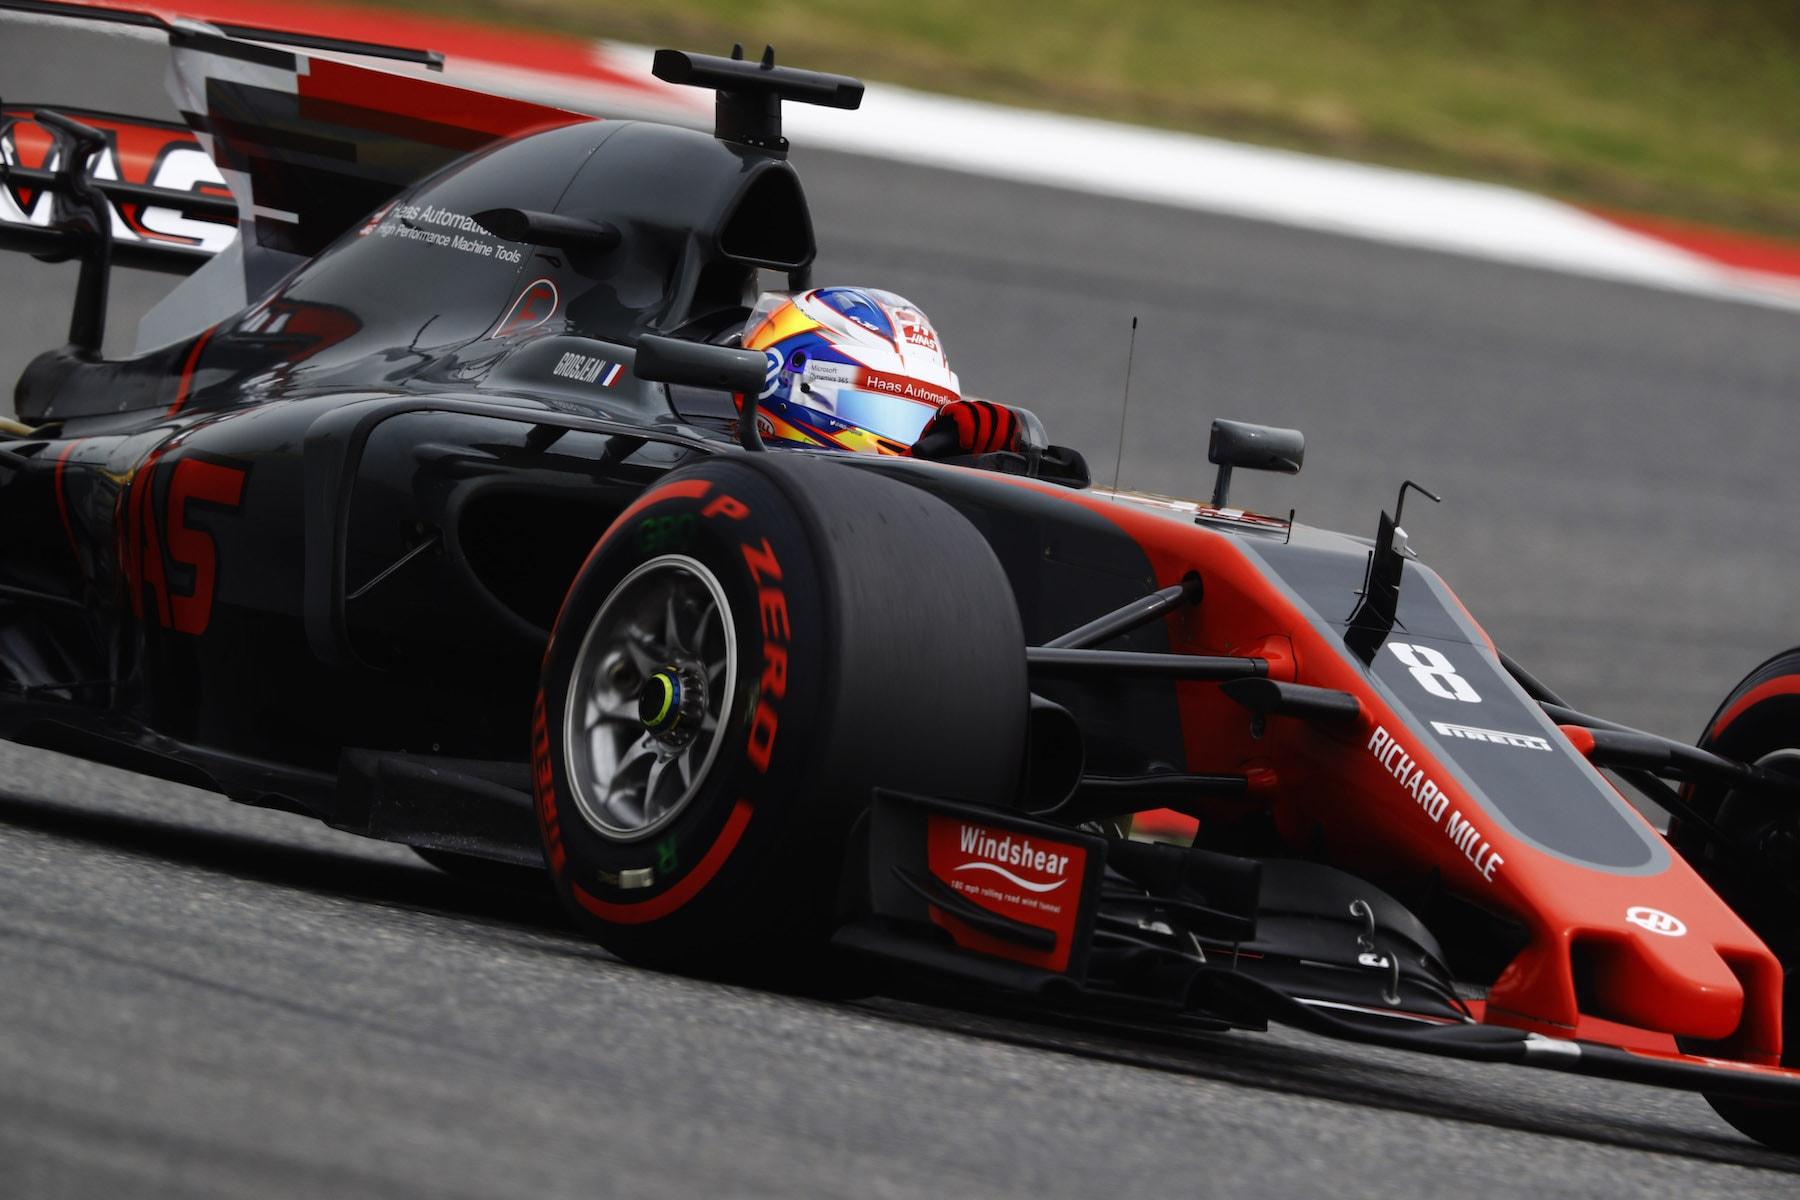 2017 Romain Grosjean | Haas VF17 | 2017 Chinese GP Q 1 copy.jpg